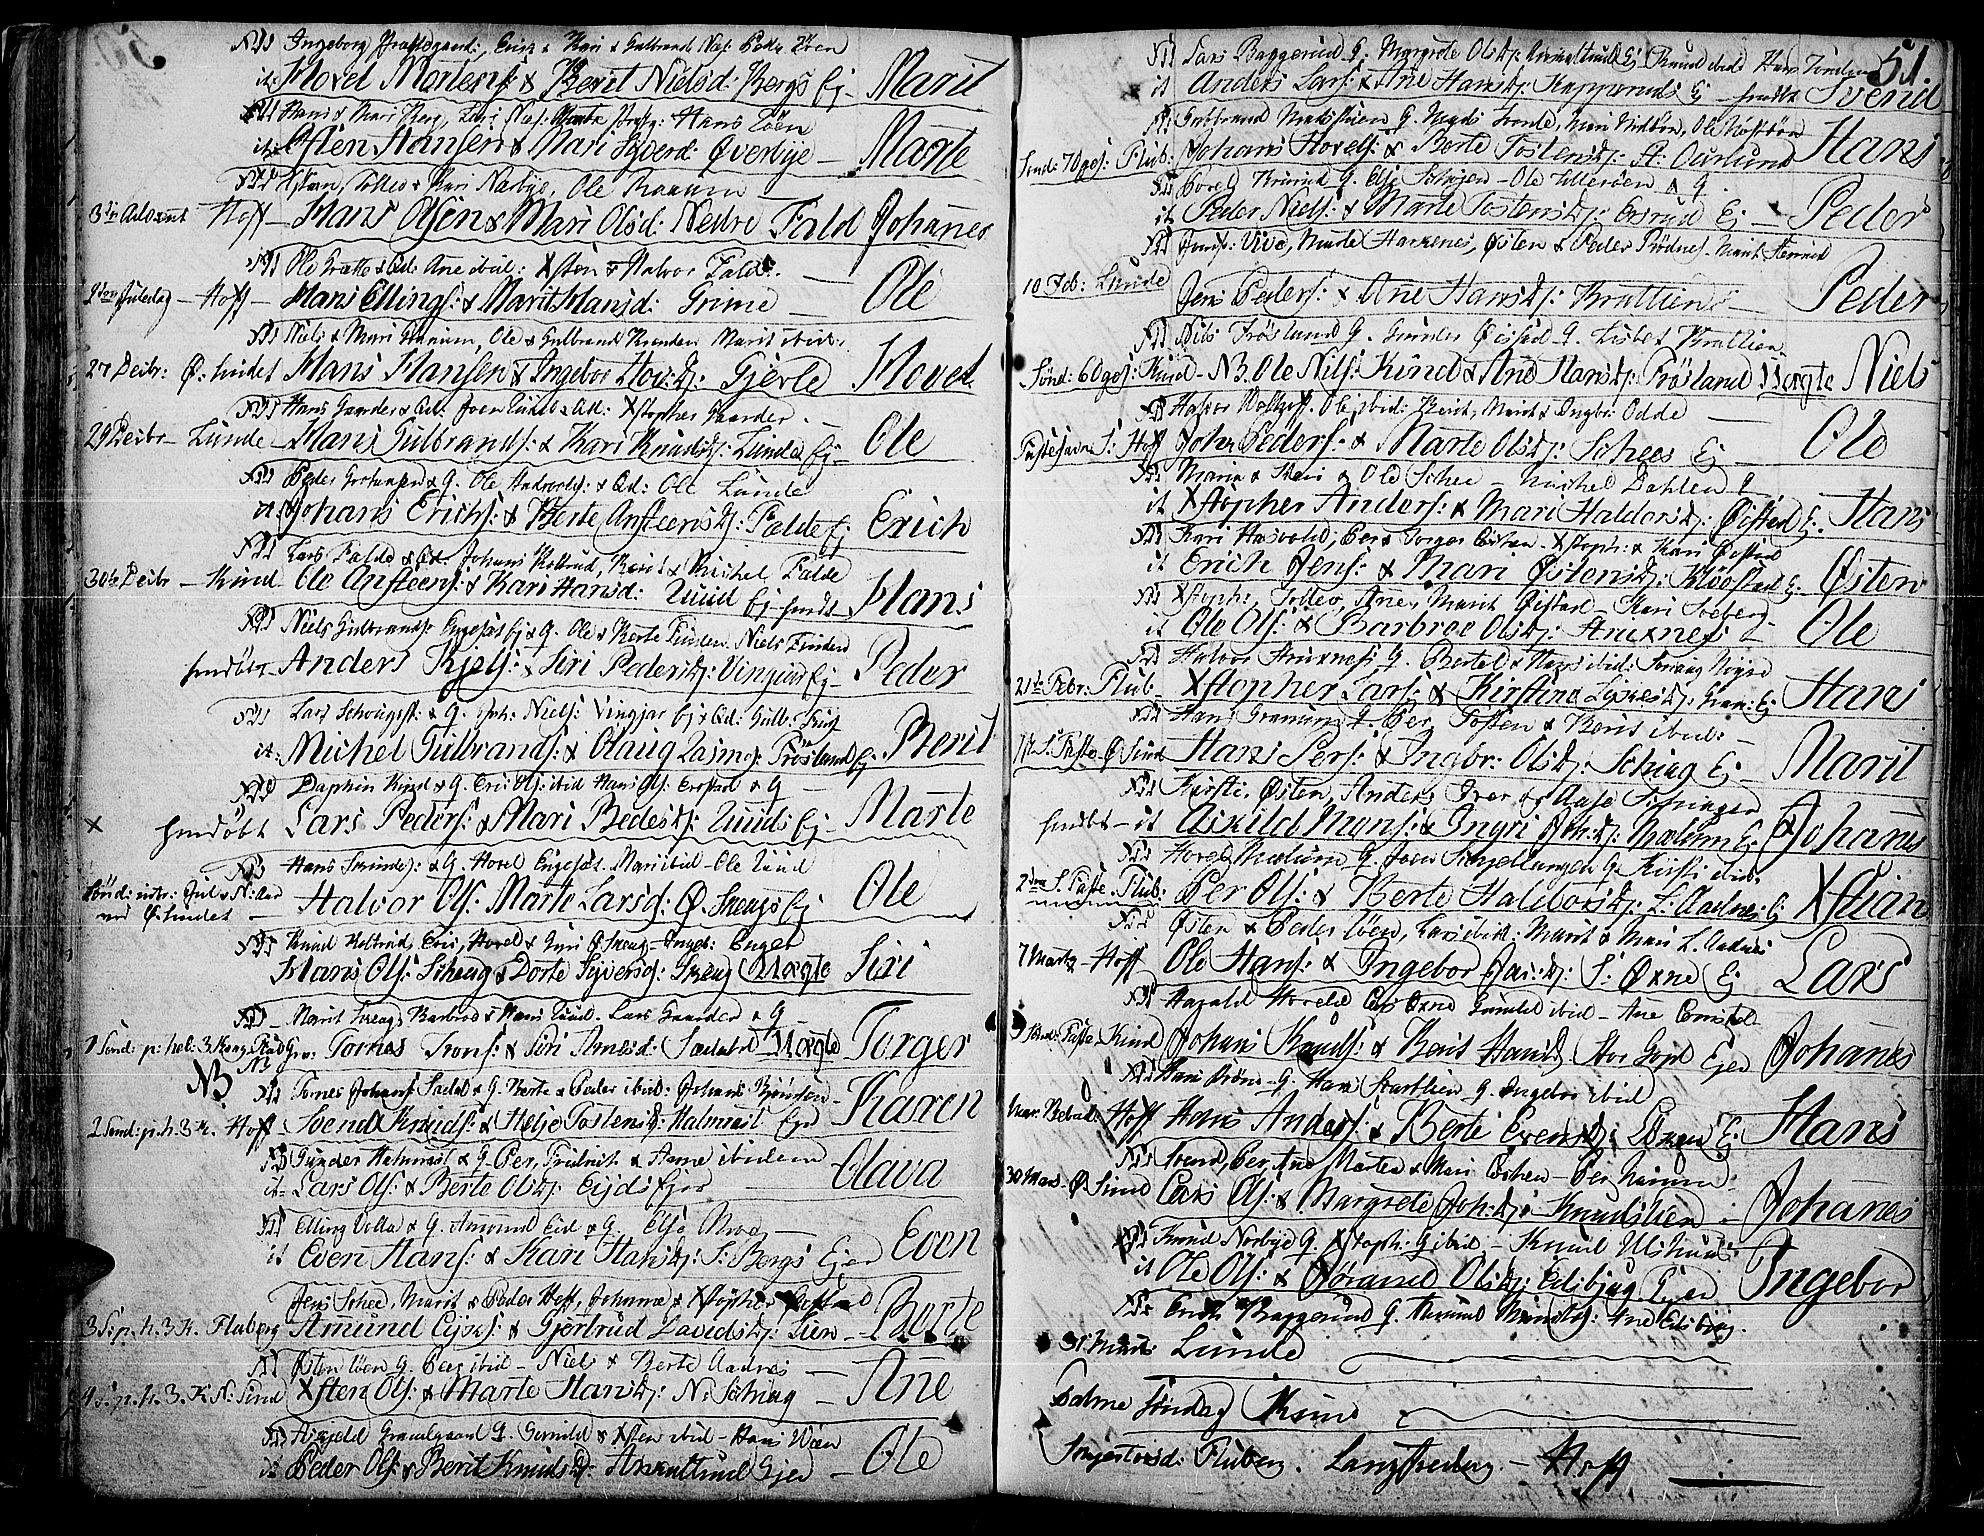 SAH, Land prestekontor, Ministerialbok nr. 6, 1784-1813, s. 51